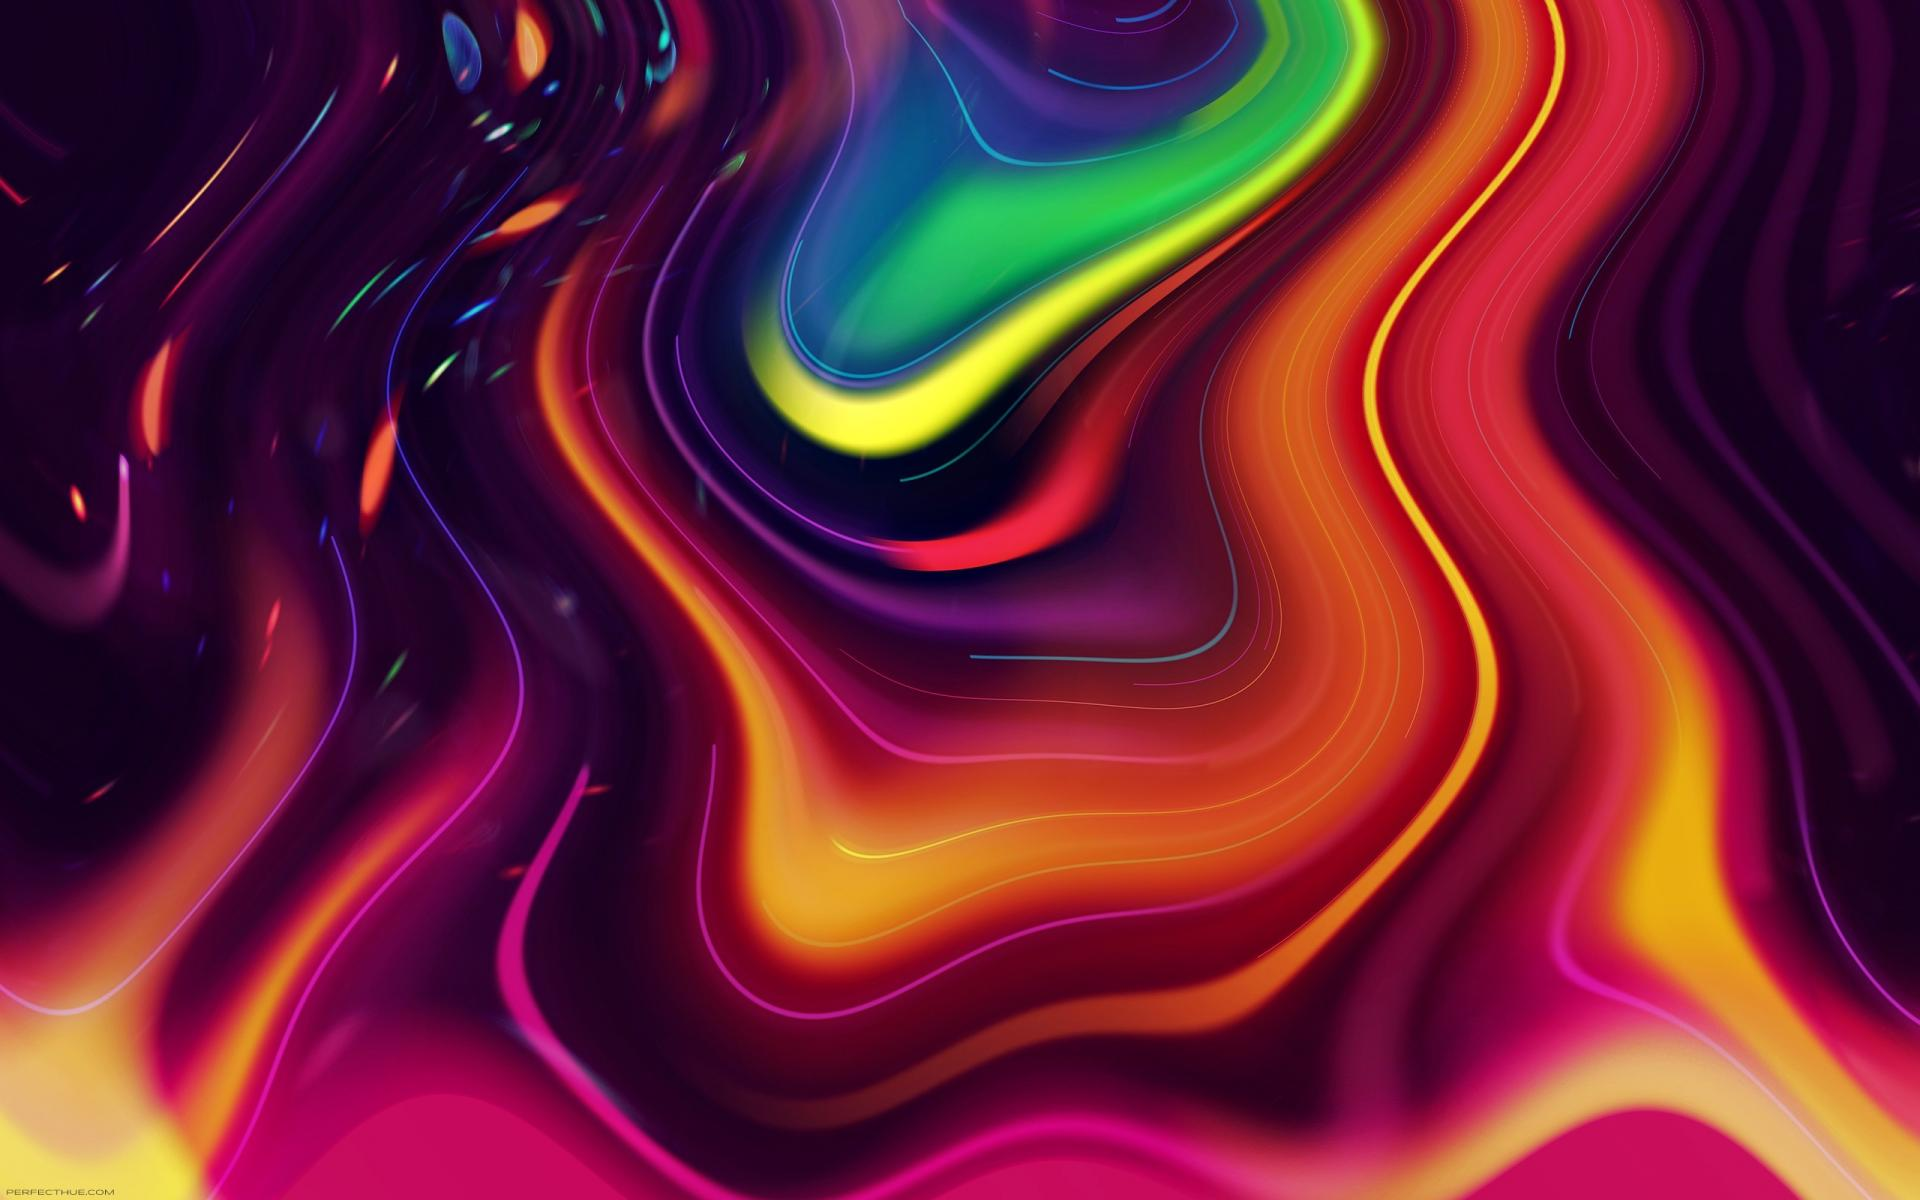 1960s wallpaper psychedelic swirls - photo #3